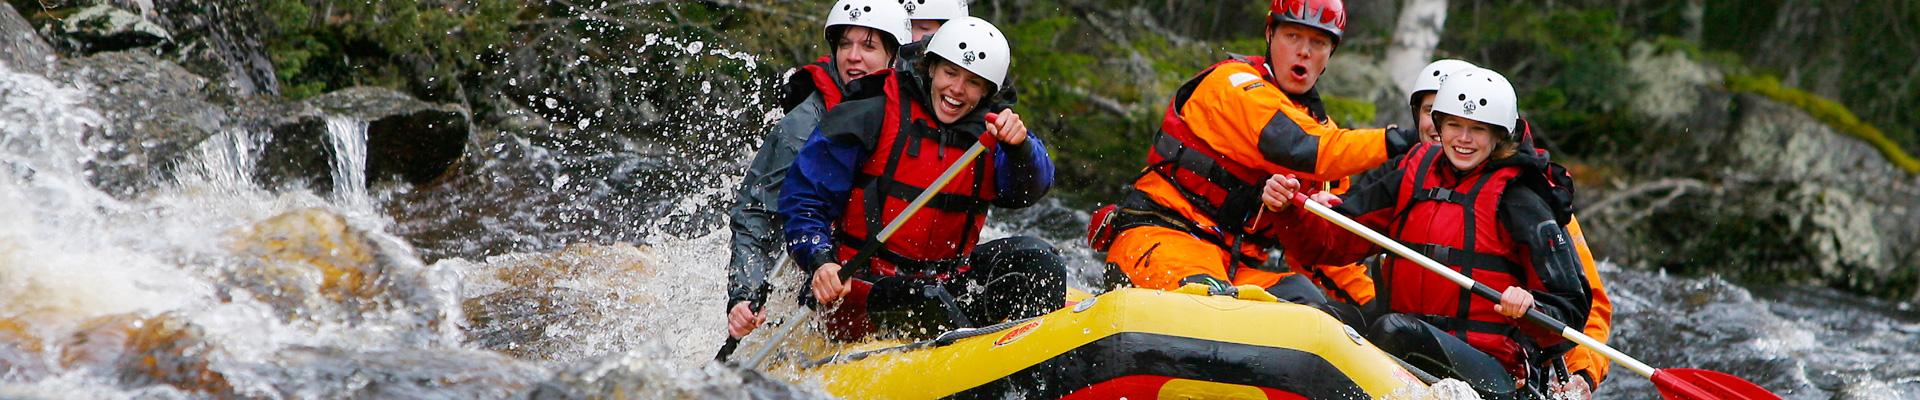 Rafting in Swedish Lapland